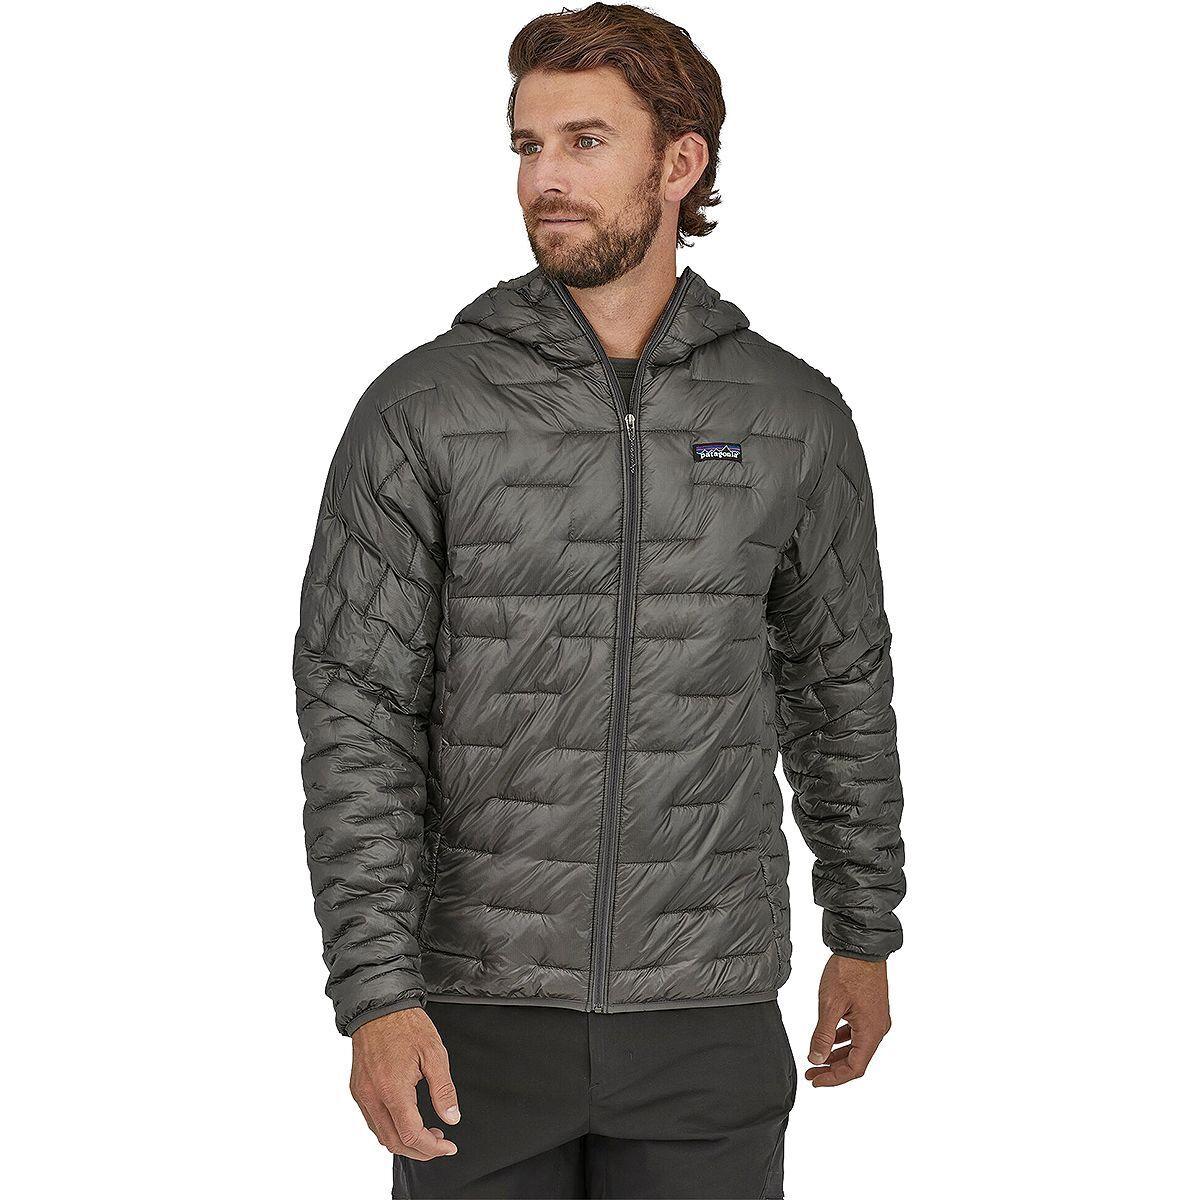 Patagonia Micro Puff Hooded Jacket